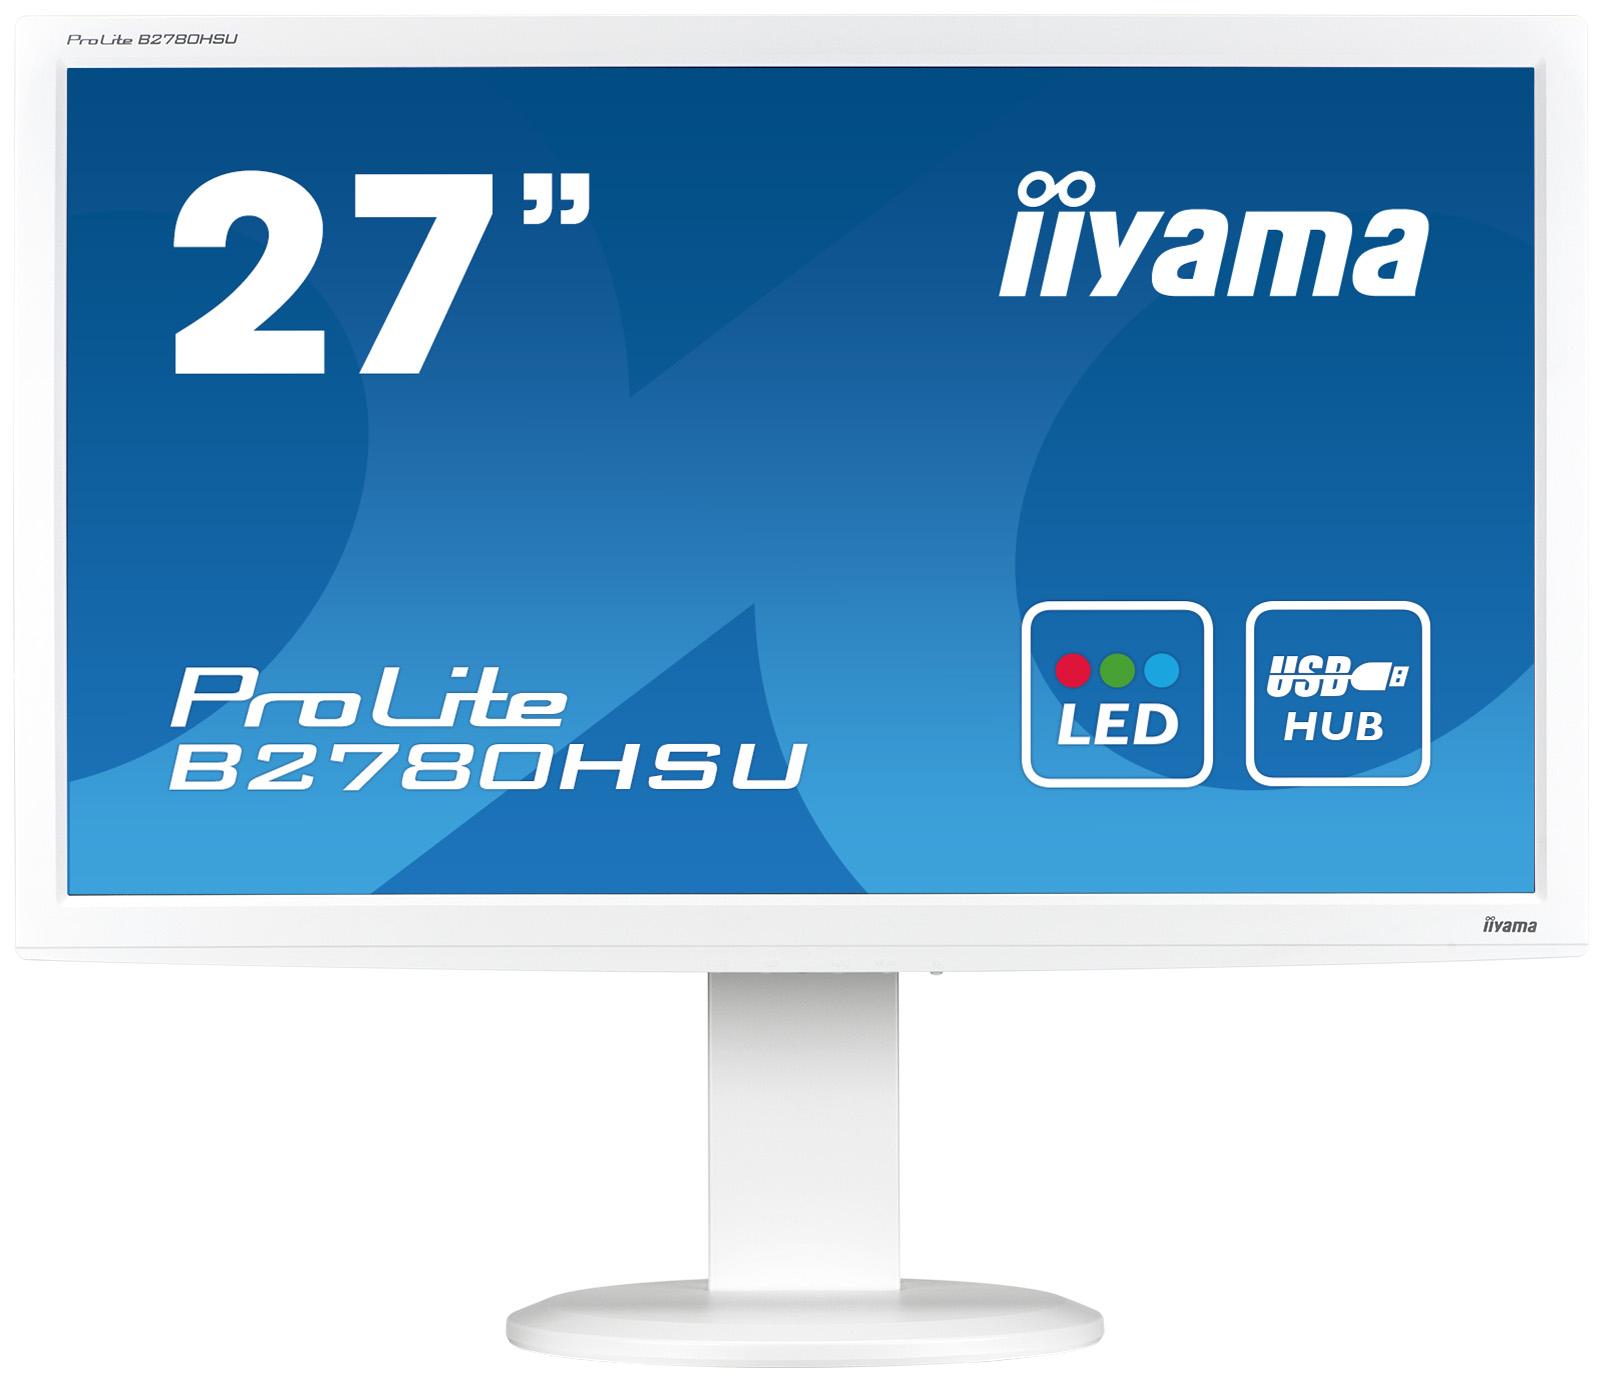 Iiyama LCD B2780HSU-W1 27'' LED,2ms,VGA/DVI/HDMI,USB,repro,1920x1080,HAS,pivot,b